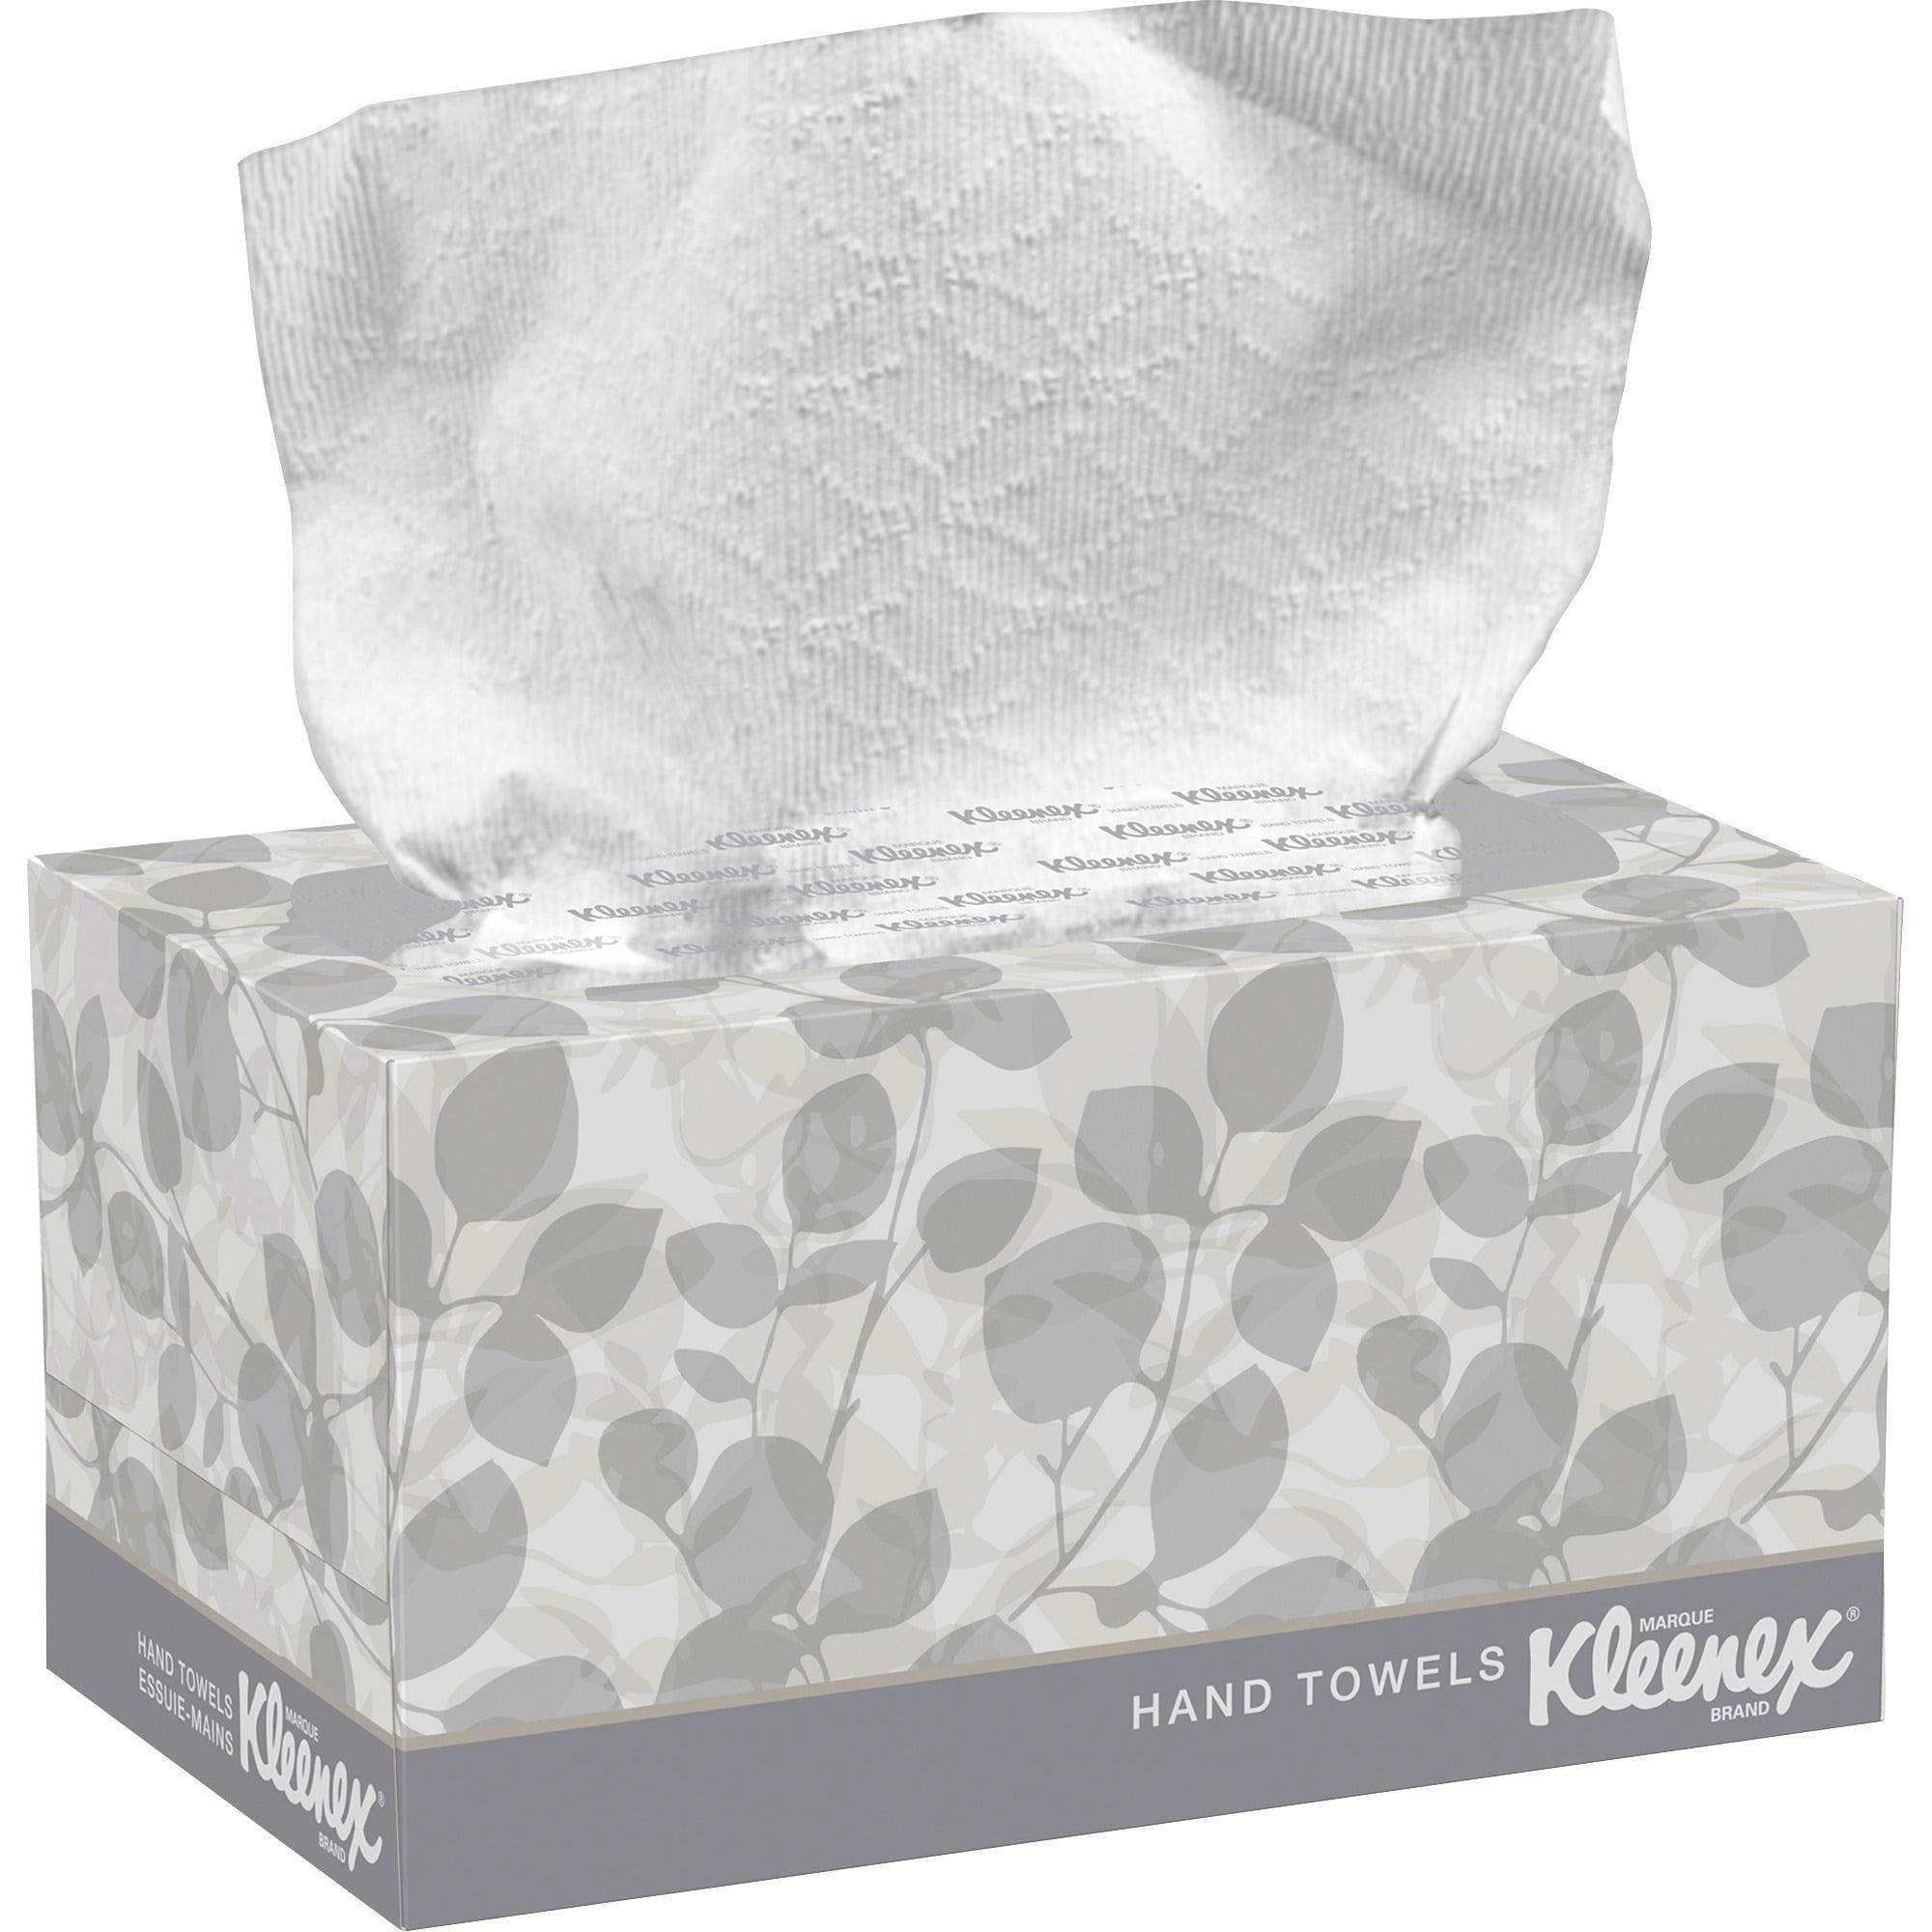 Kimberly-Clark, KCC01701, Kleenex Boxed Hand Towels, 120 / Box, White